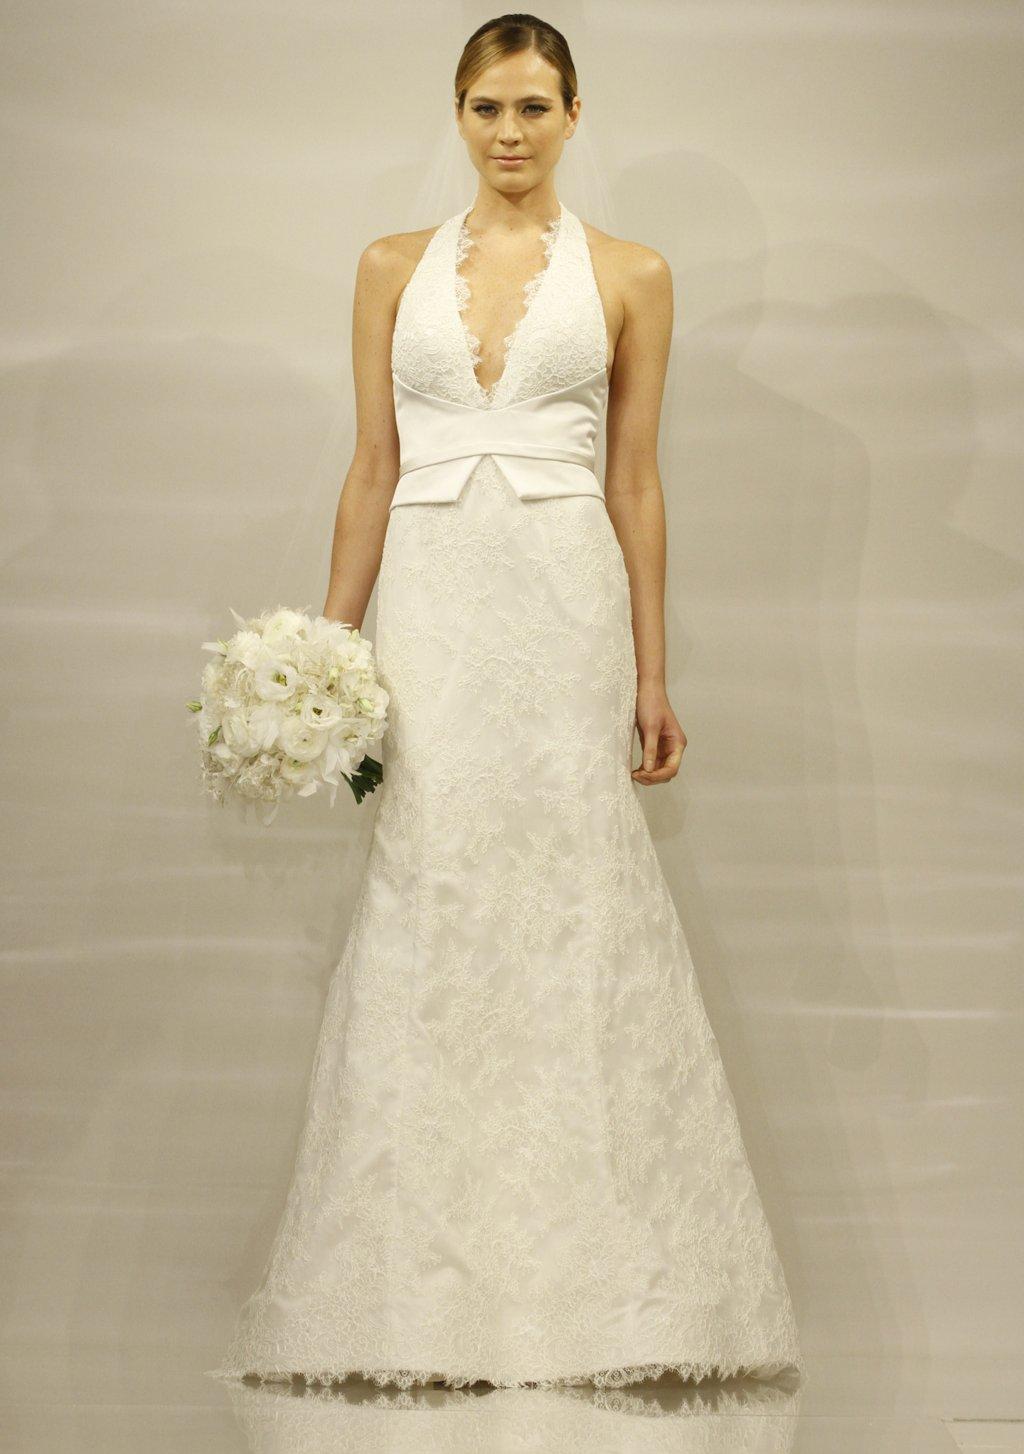 Bridgette-wedding-dress-by-theia-fall-2014-bridal.full